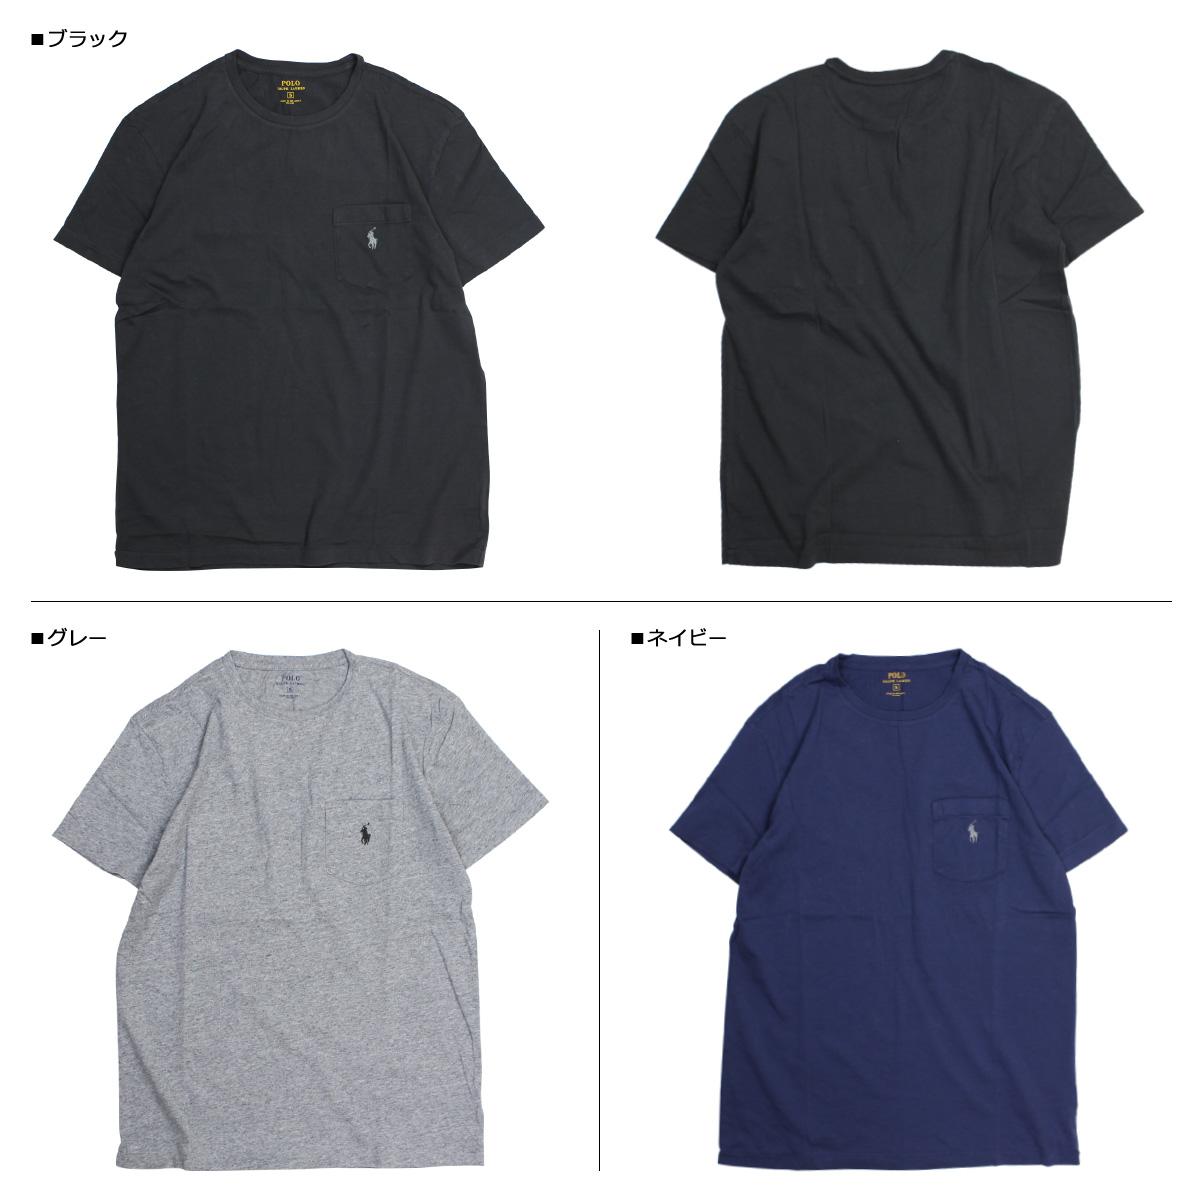 Ralph Lauren T-shirt men short sleeves POLO RALPH LAUREN U neck polo T-shirt  T-SHIRTS TEE 4 color [7/26 Shinnyu load]